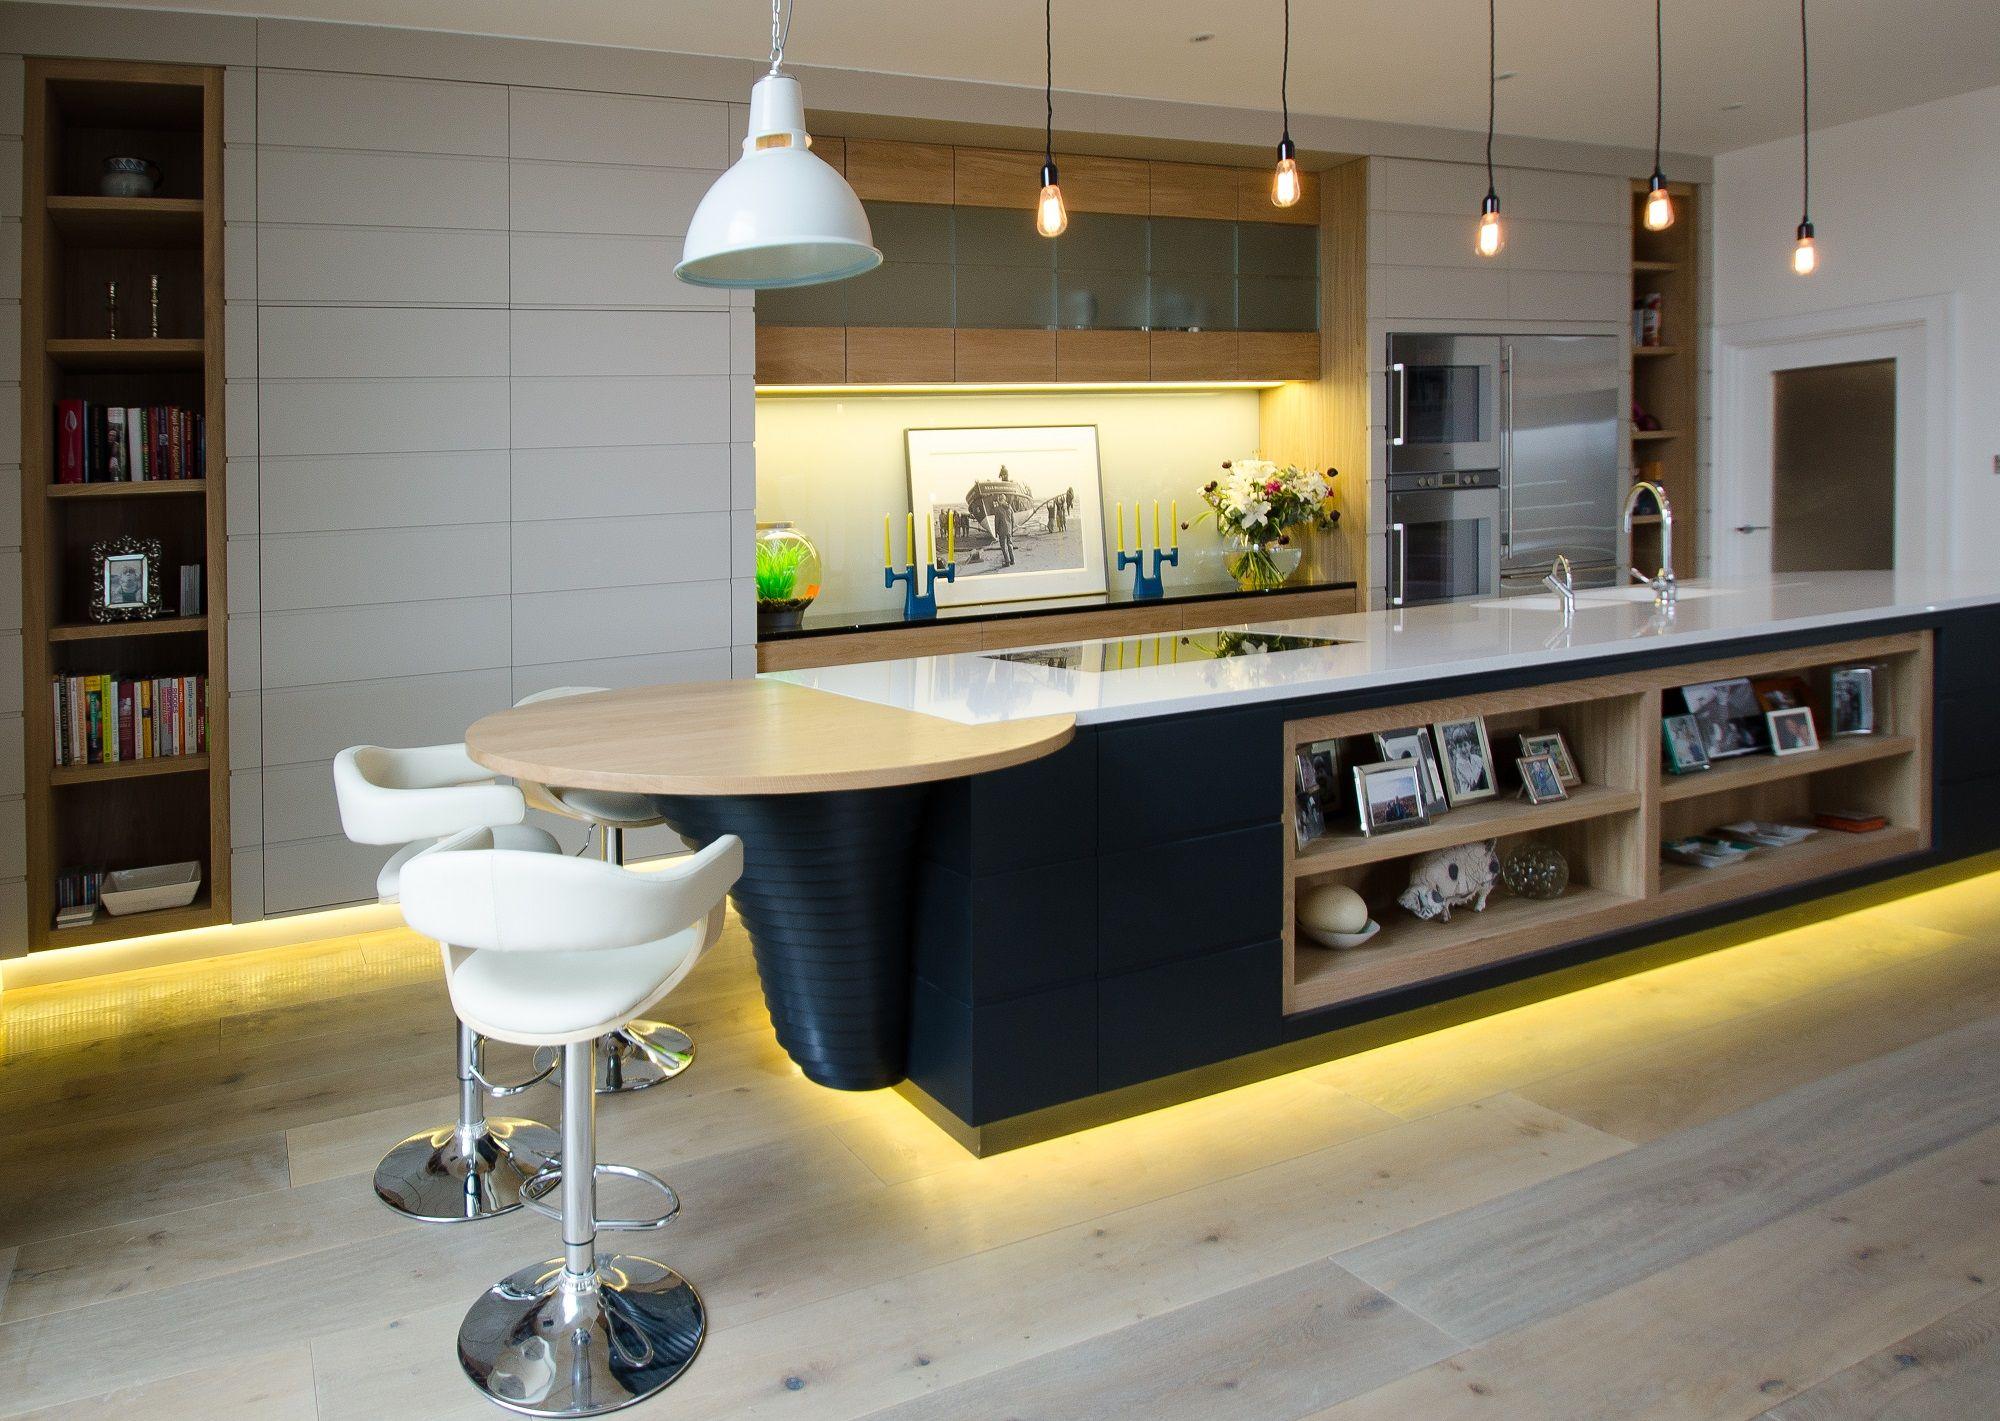 Diy Professional Led Lighting Ideas For Your Homes Design Modern Kitchen Lighting Kitchen Plinth Lights Kitchen Plinth